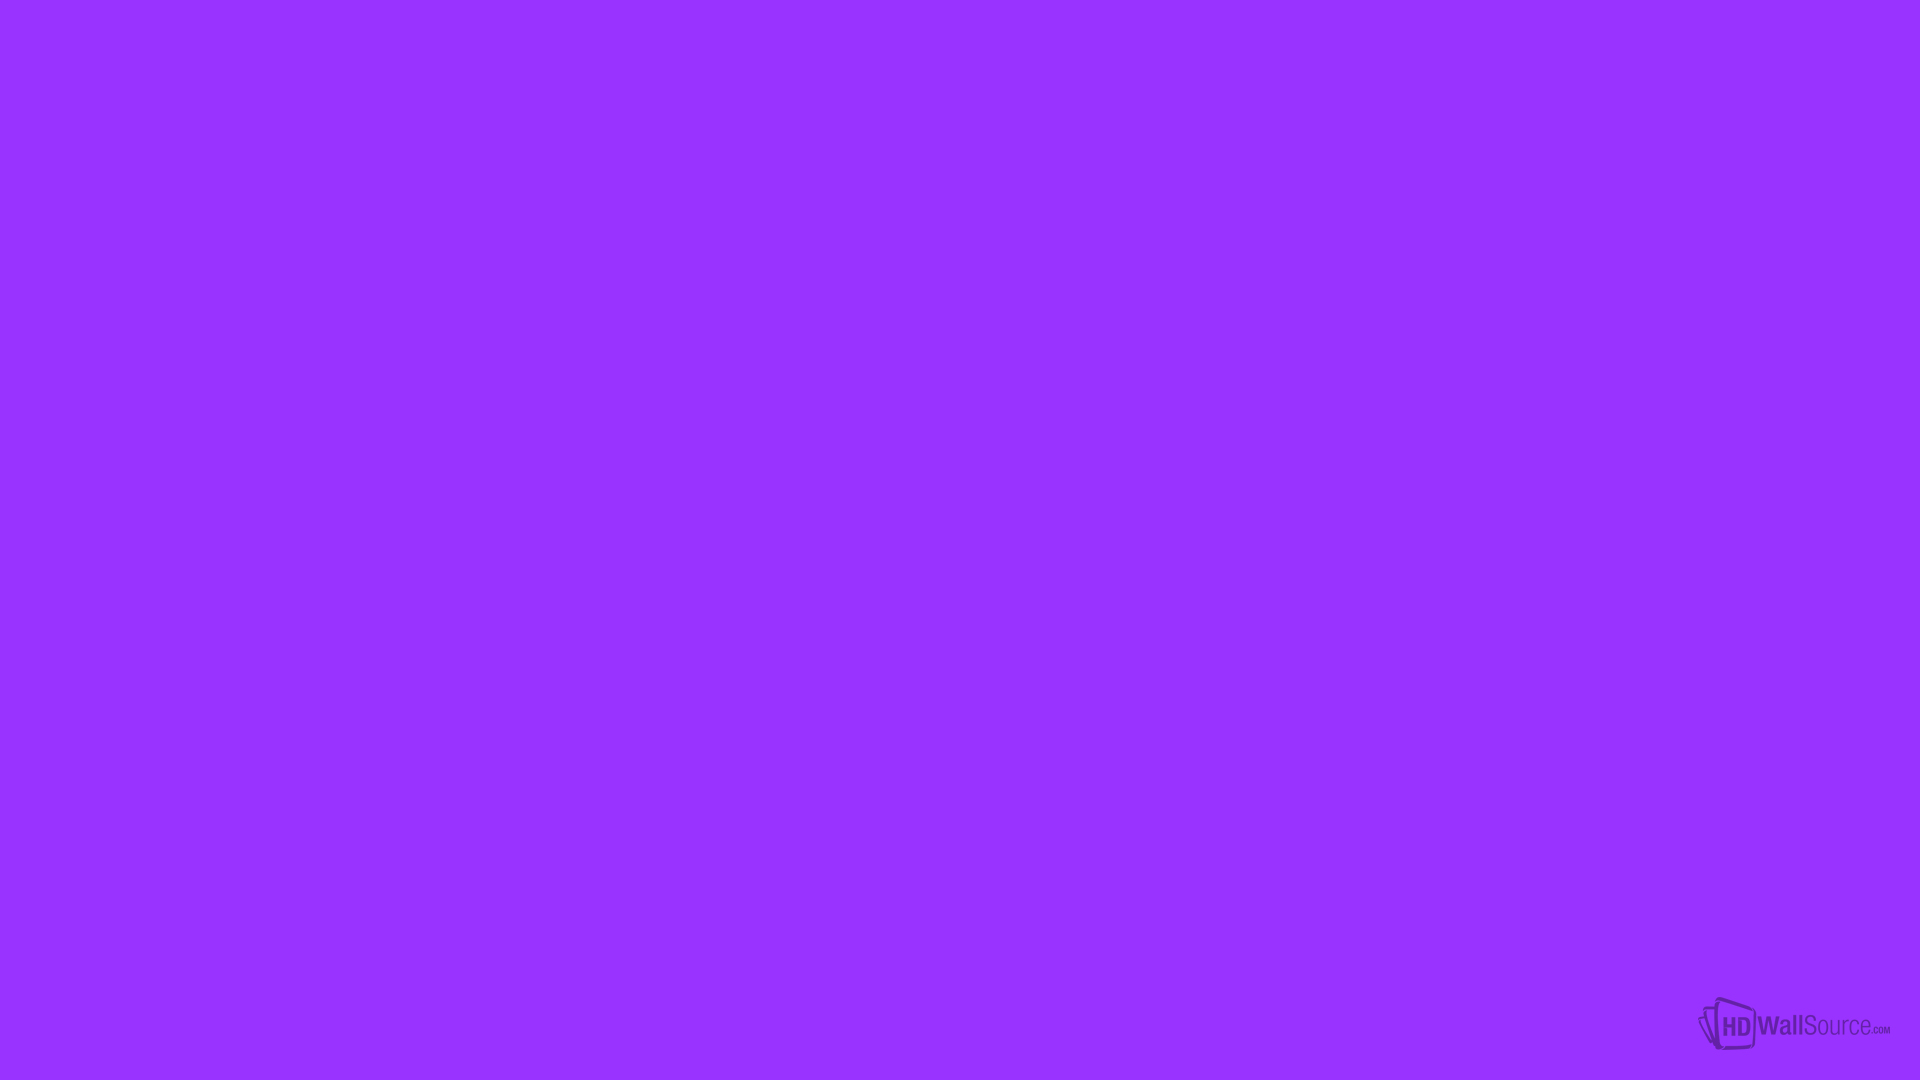 9933ff wallpaper 71045